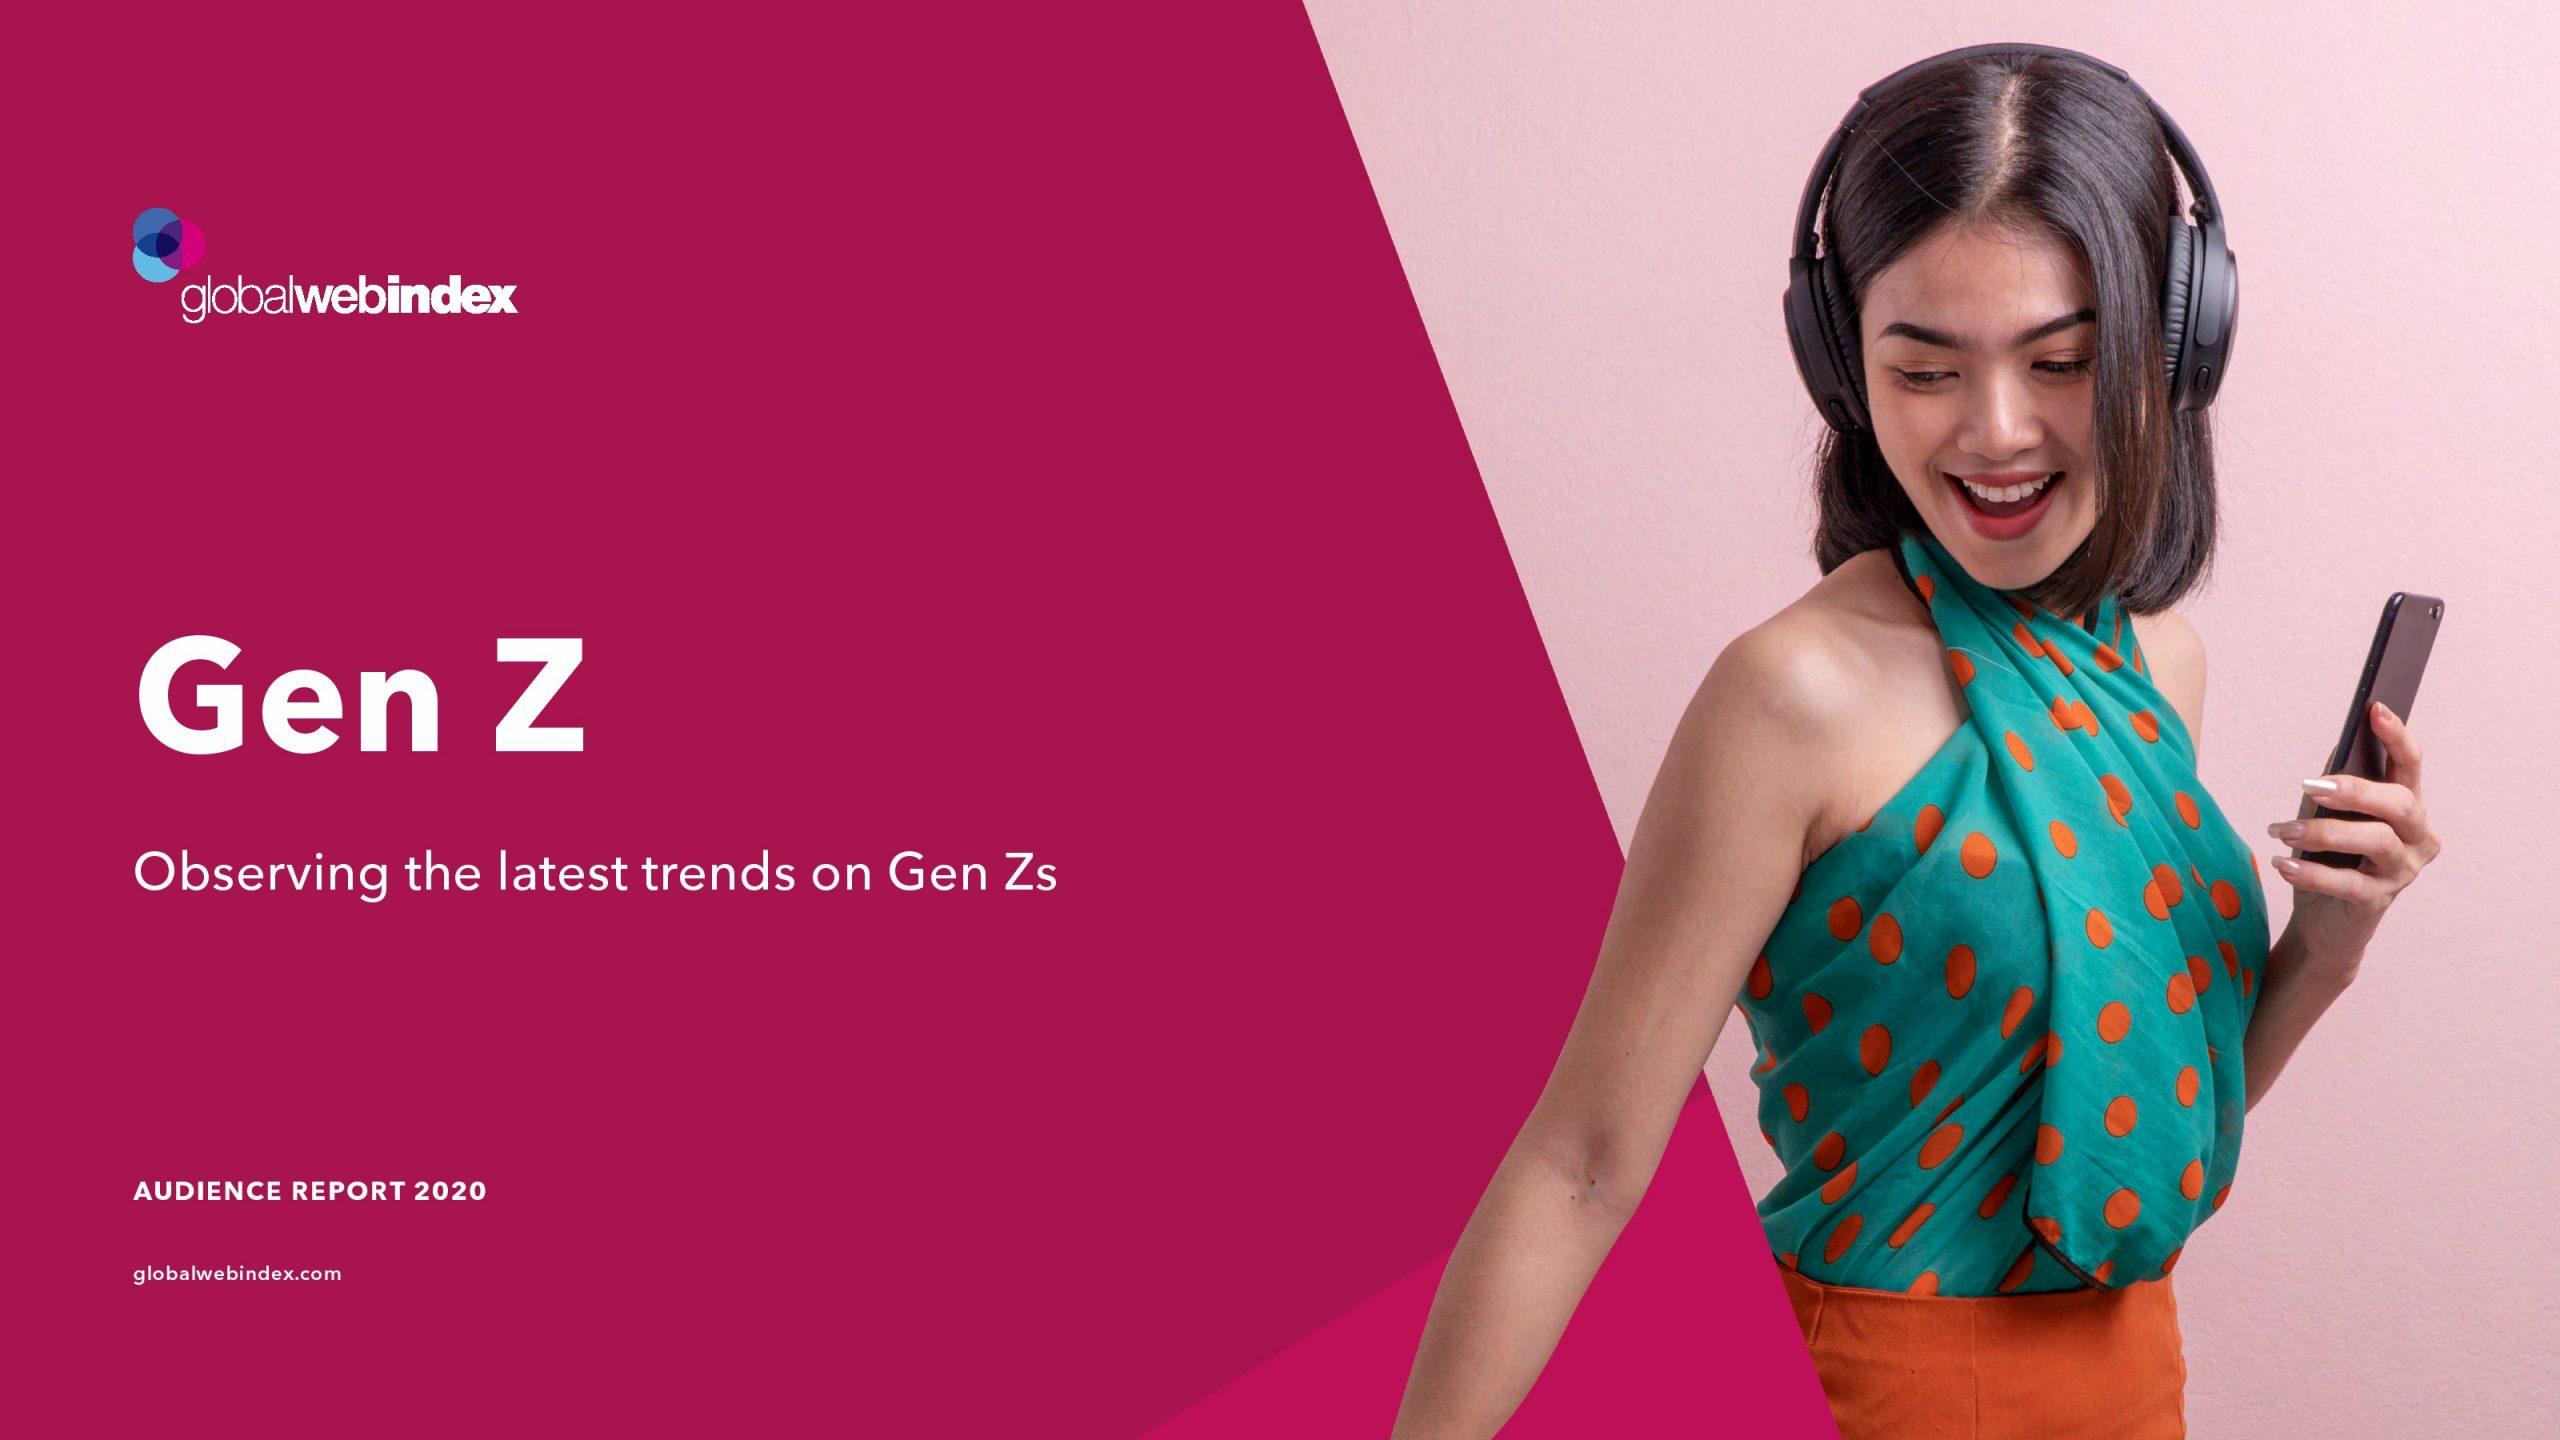 GWI:Z世代的最新趋势报告